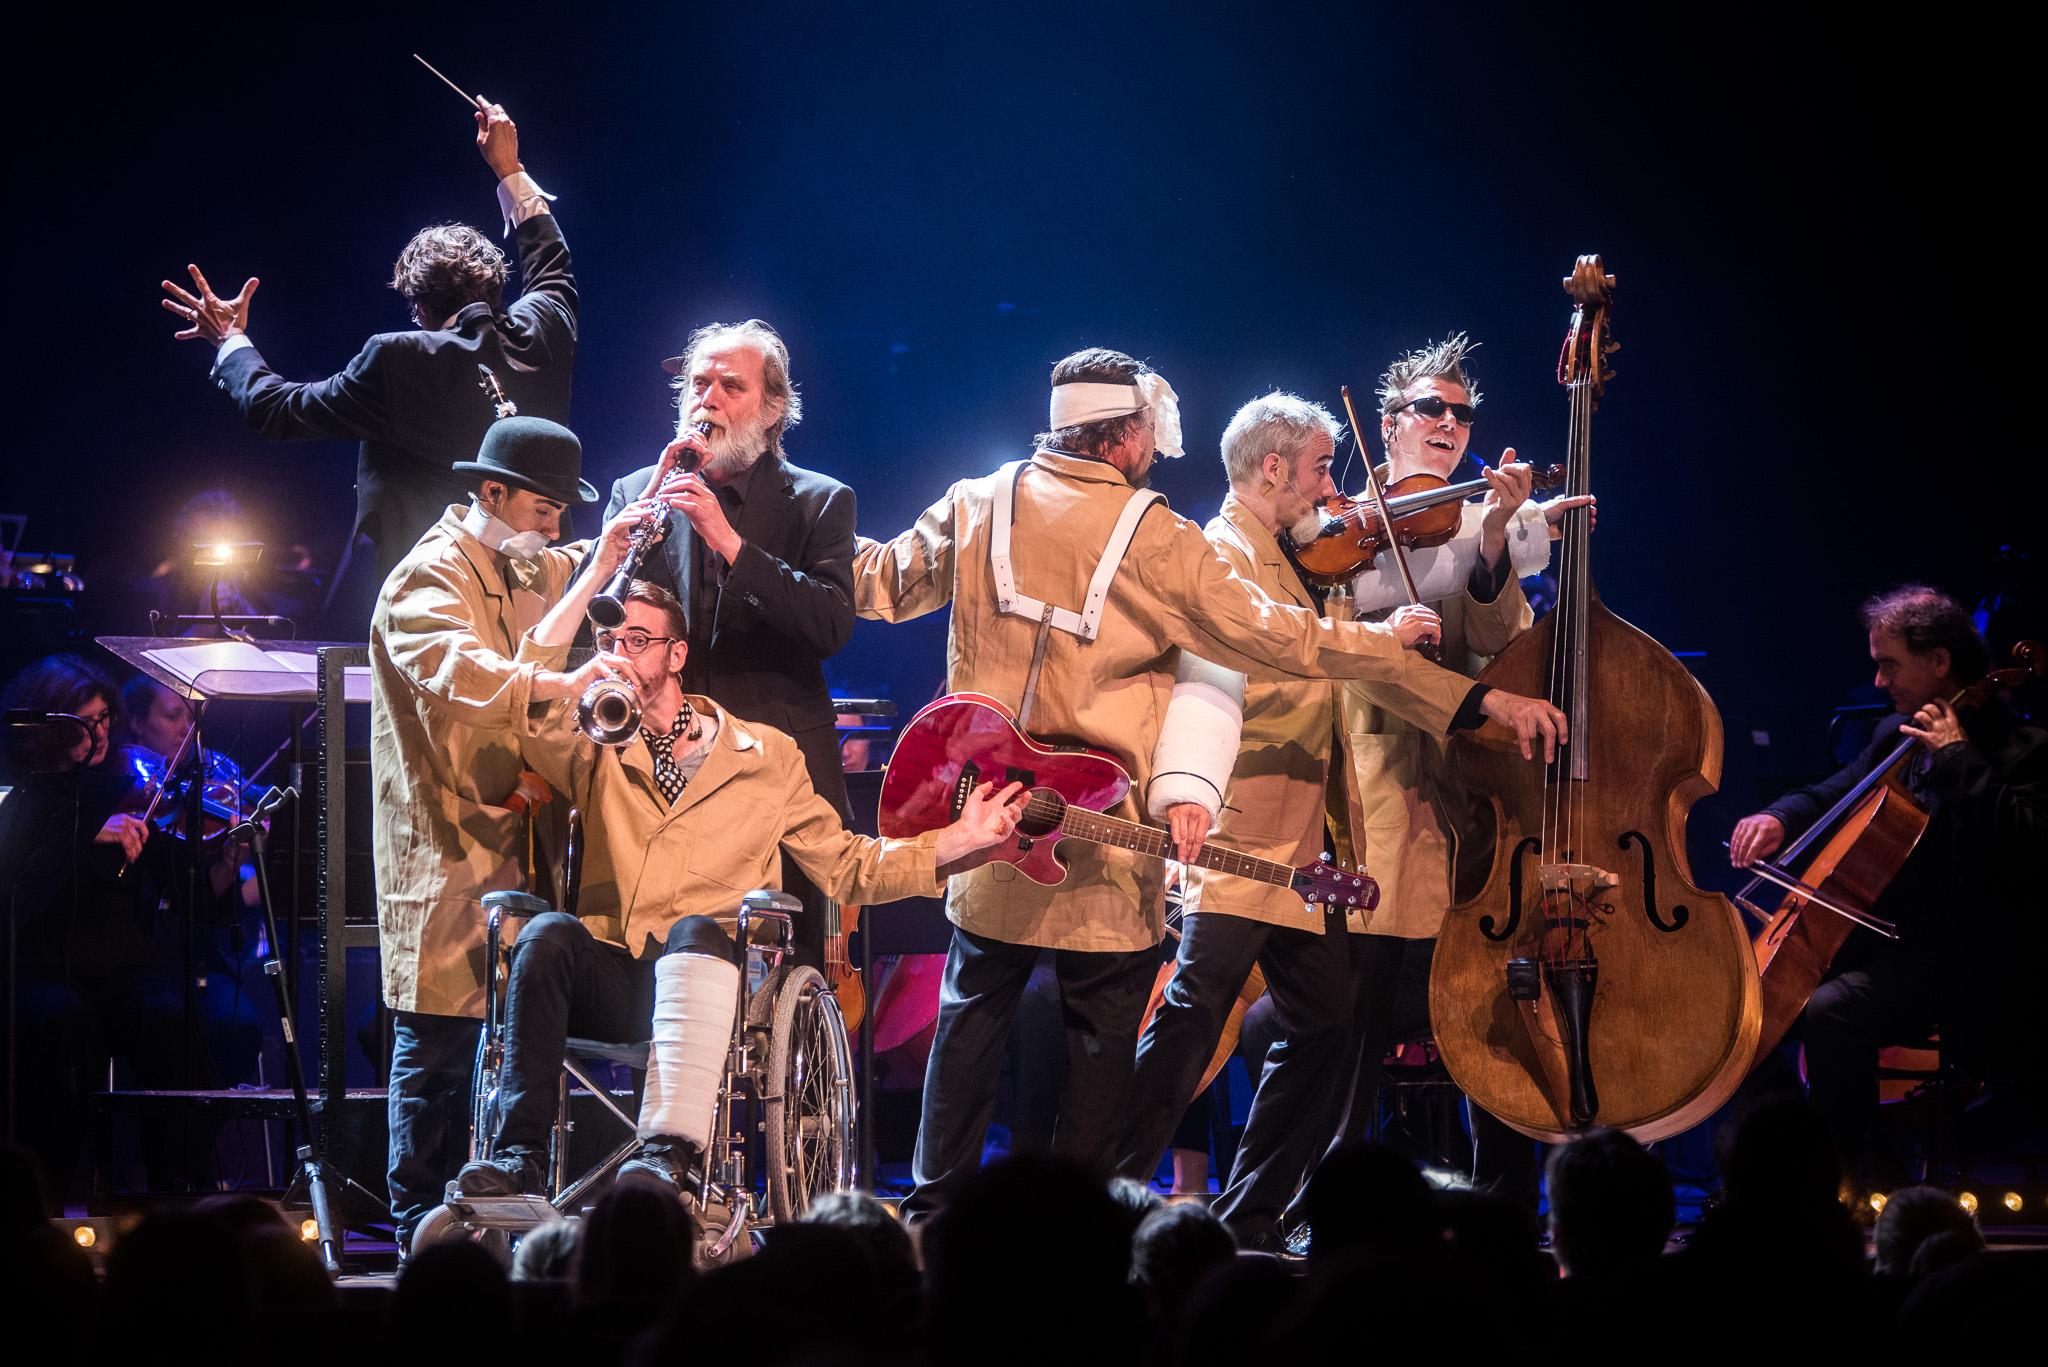 Pieter Roelf Jeugdconcert 2018: Noord Nederlands Orkest & Wëreldbänd